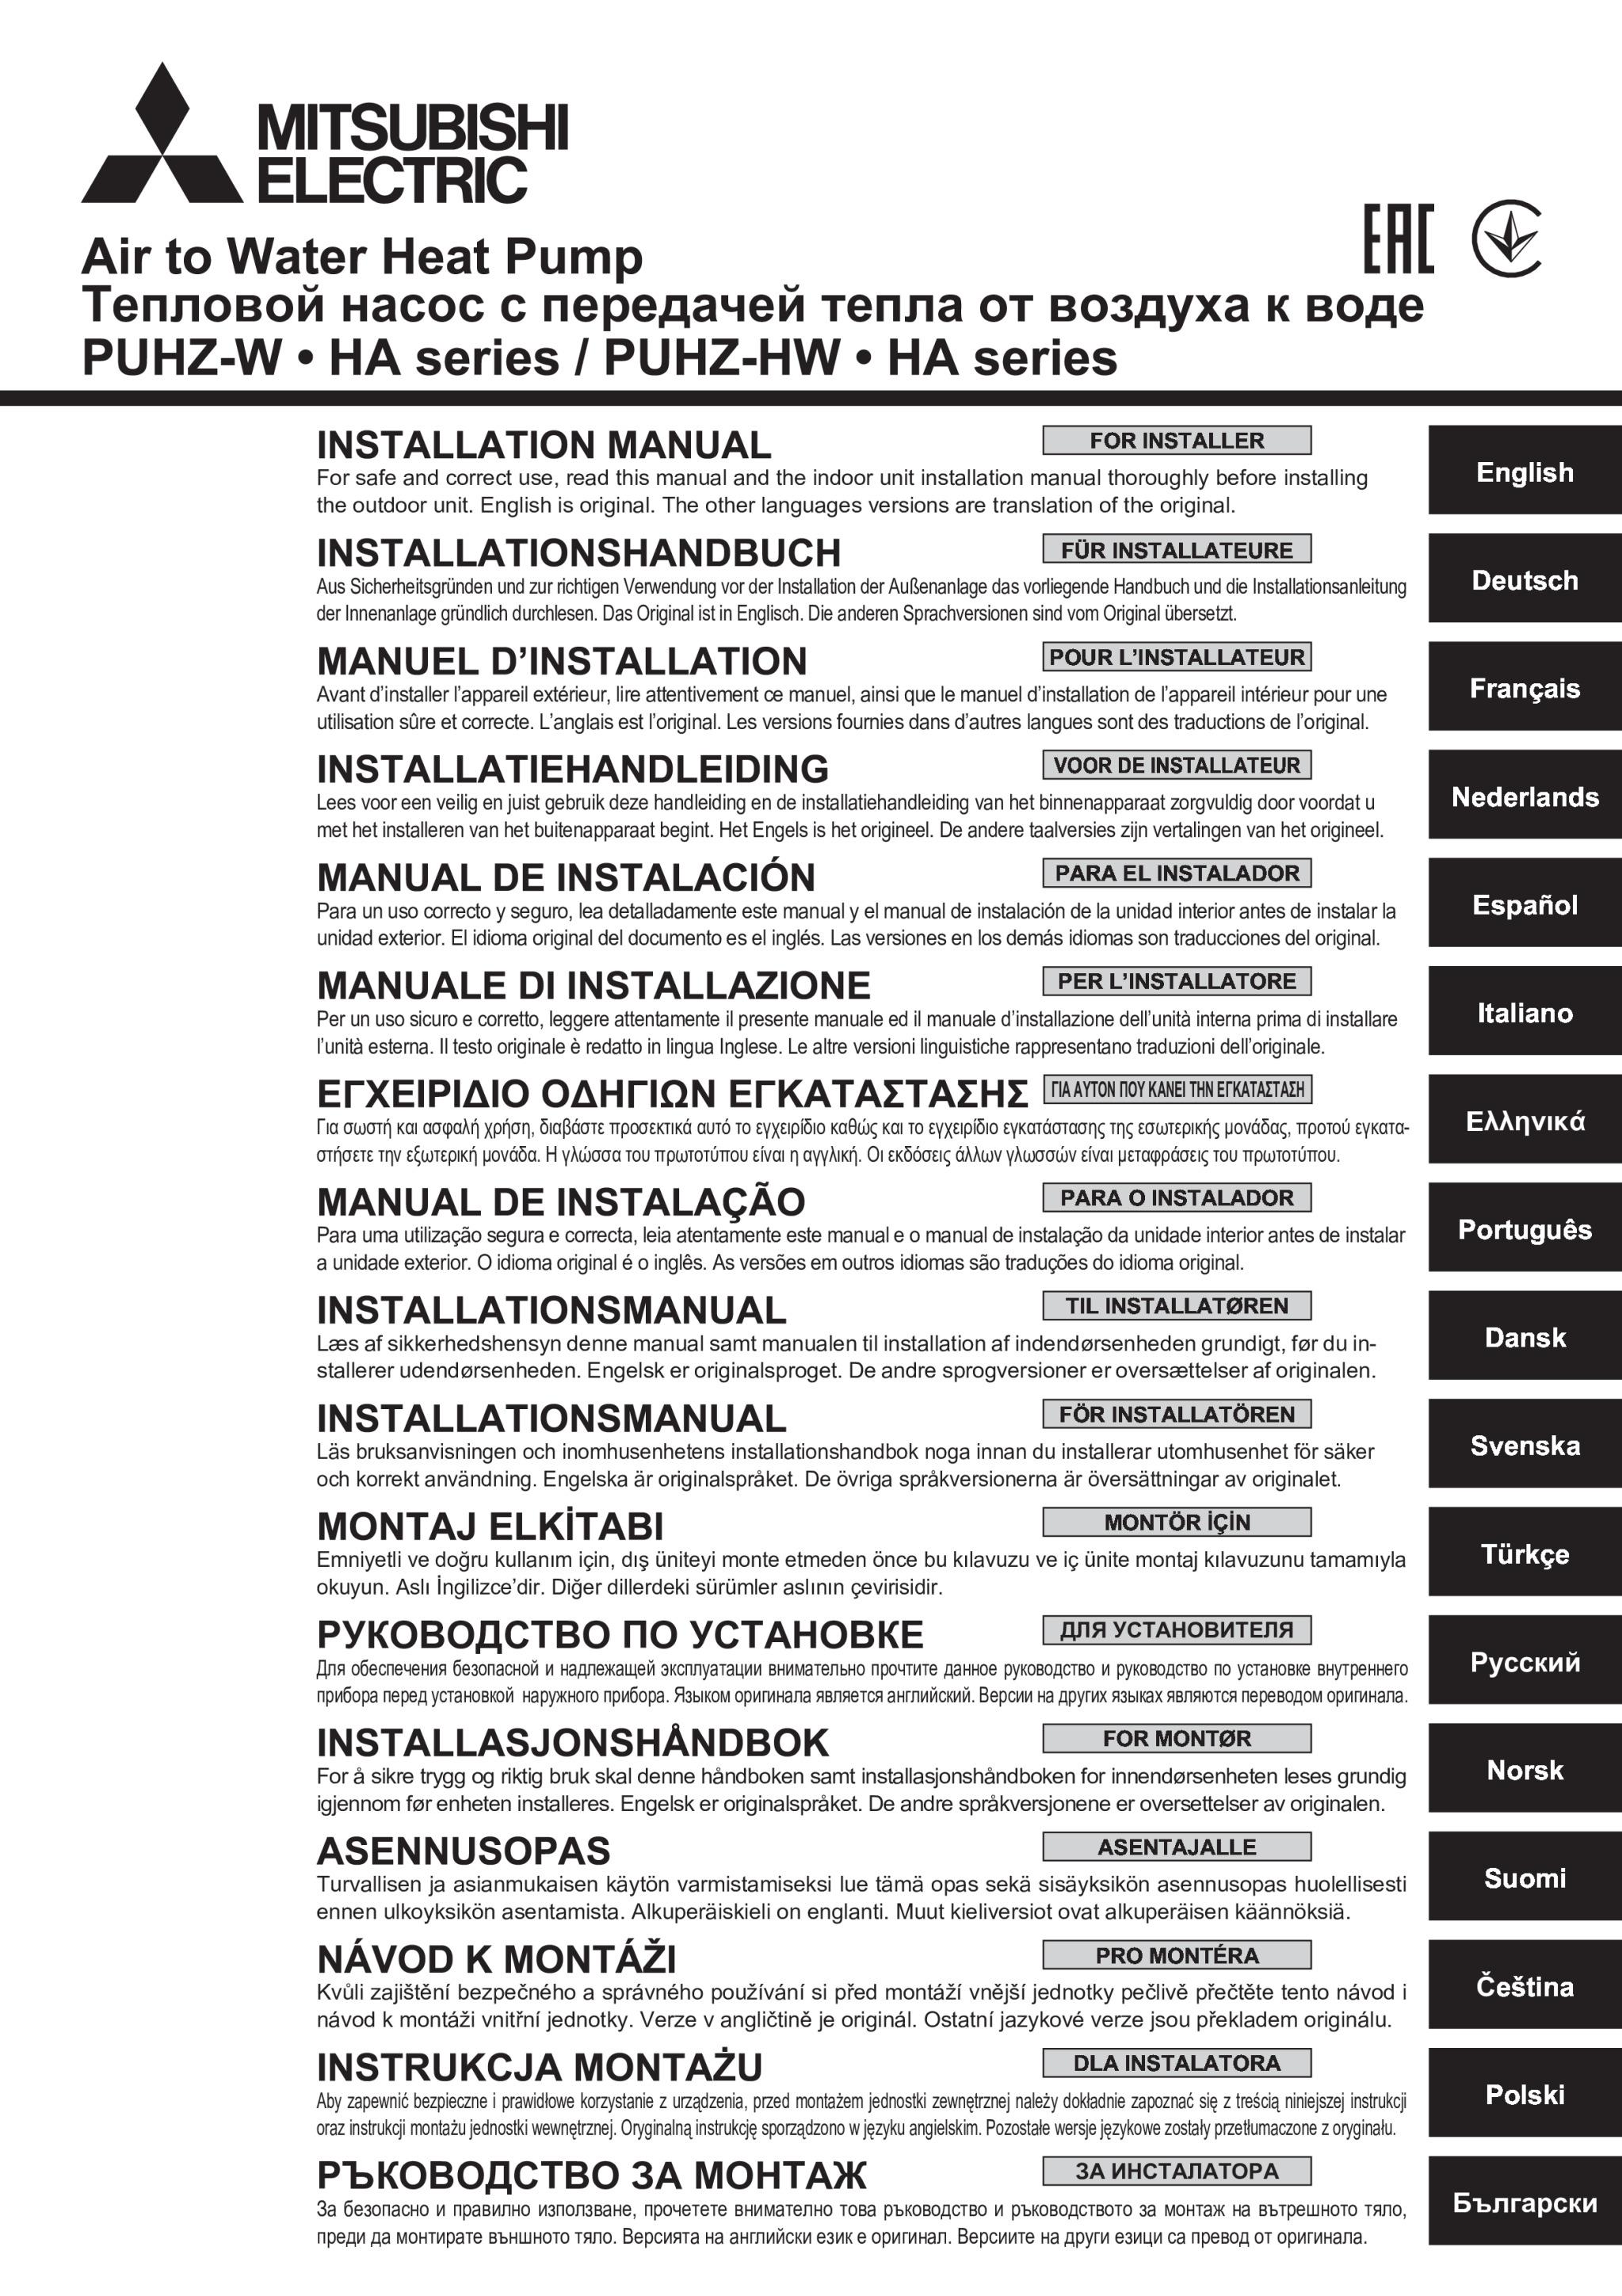 ecodan puhz h w installation manual bh79d532h03 mitsubishi electric rh library mitsubishielectric co uk Mitsubishi Eclipse Manual mitsubishi electric ecodan user manual